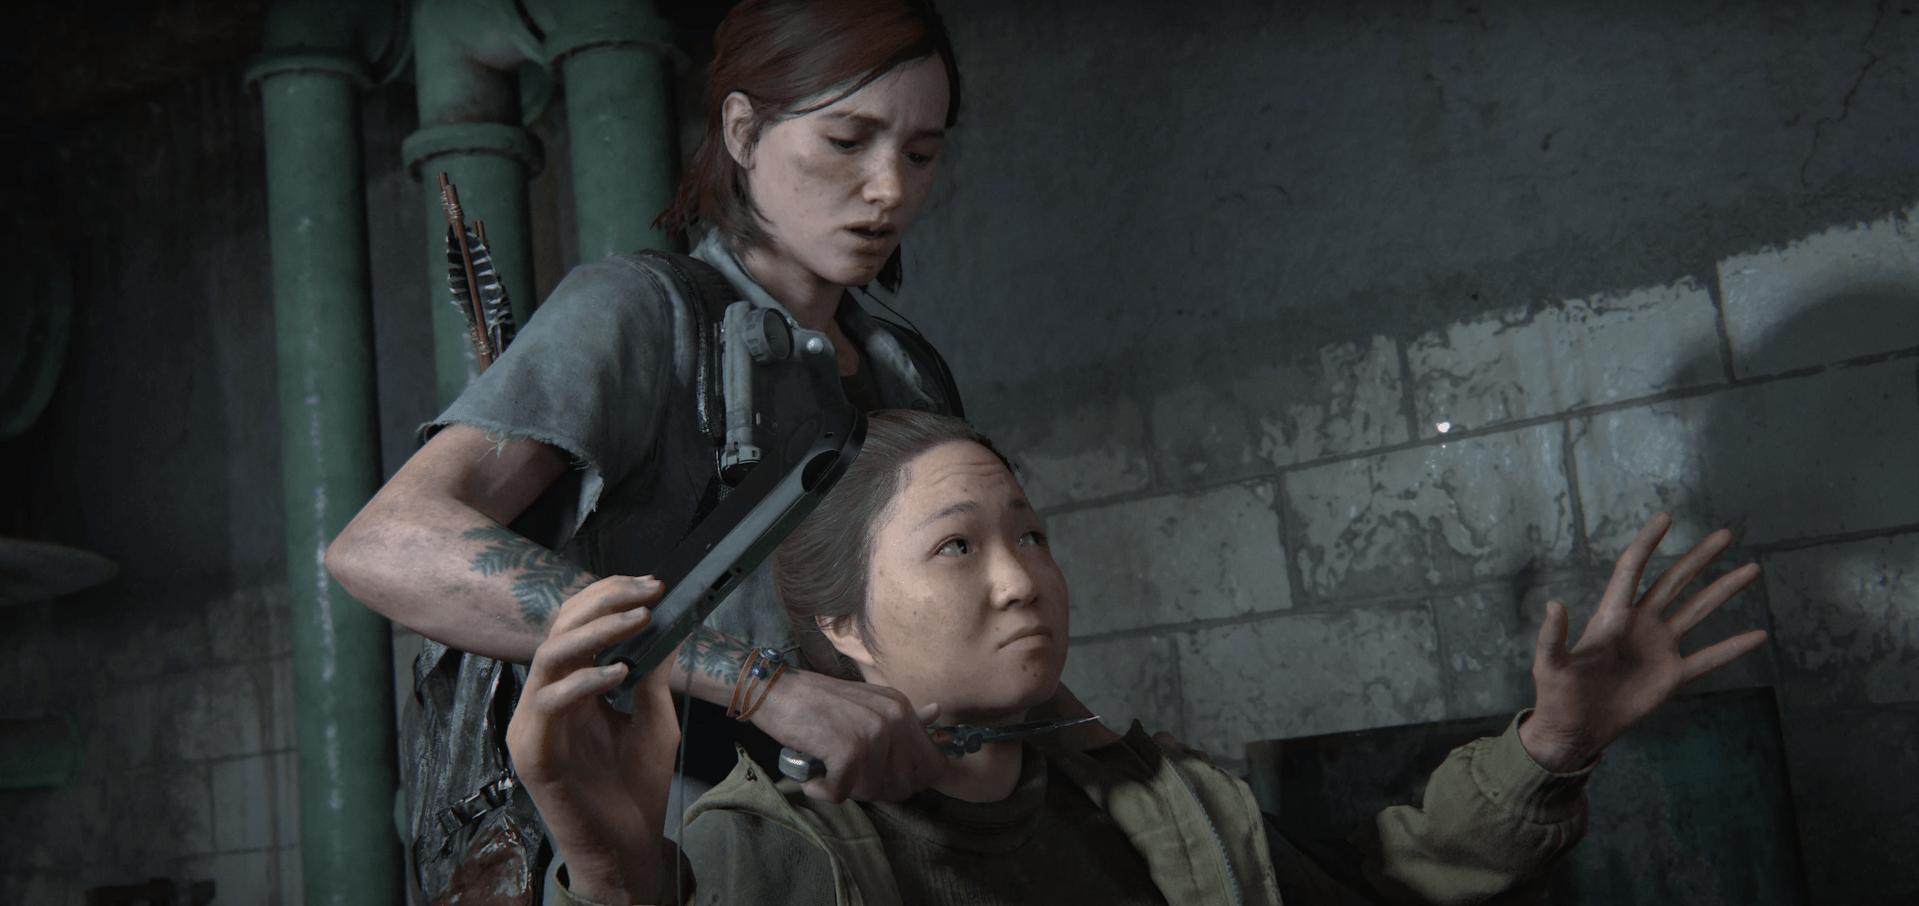 The Last Of Us Parte Ii - Recensione 4 - Hynerd.it